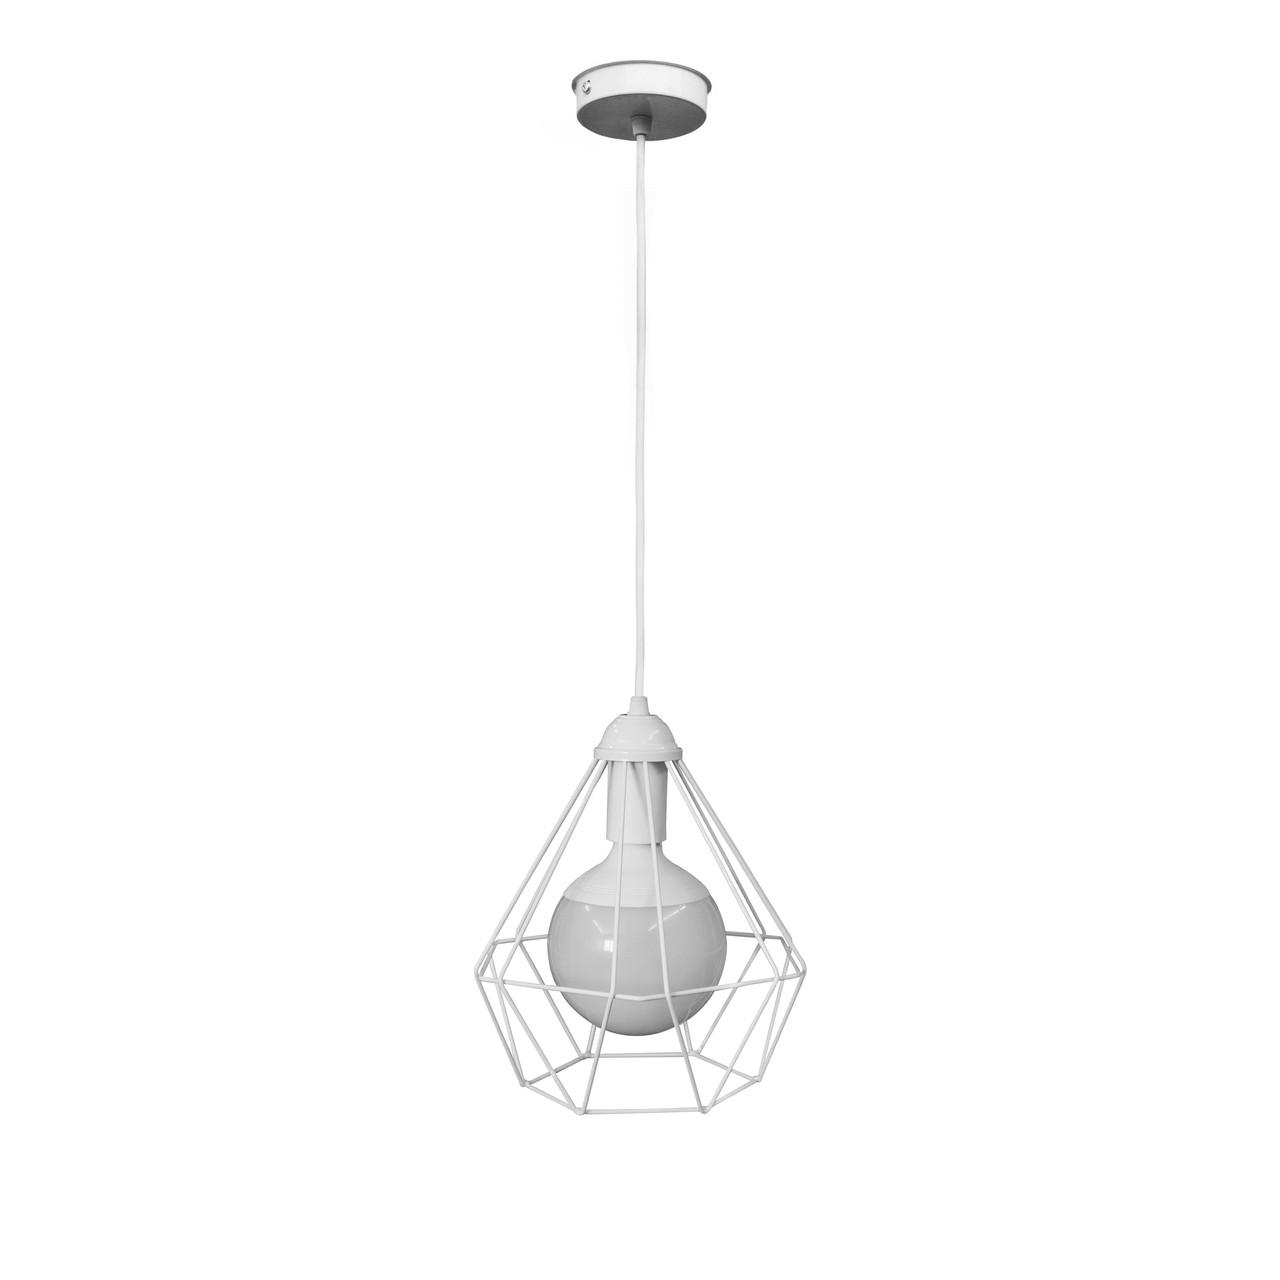 Светильник подвесной в стиле лофт NL 0537 W MSK Electric